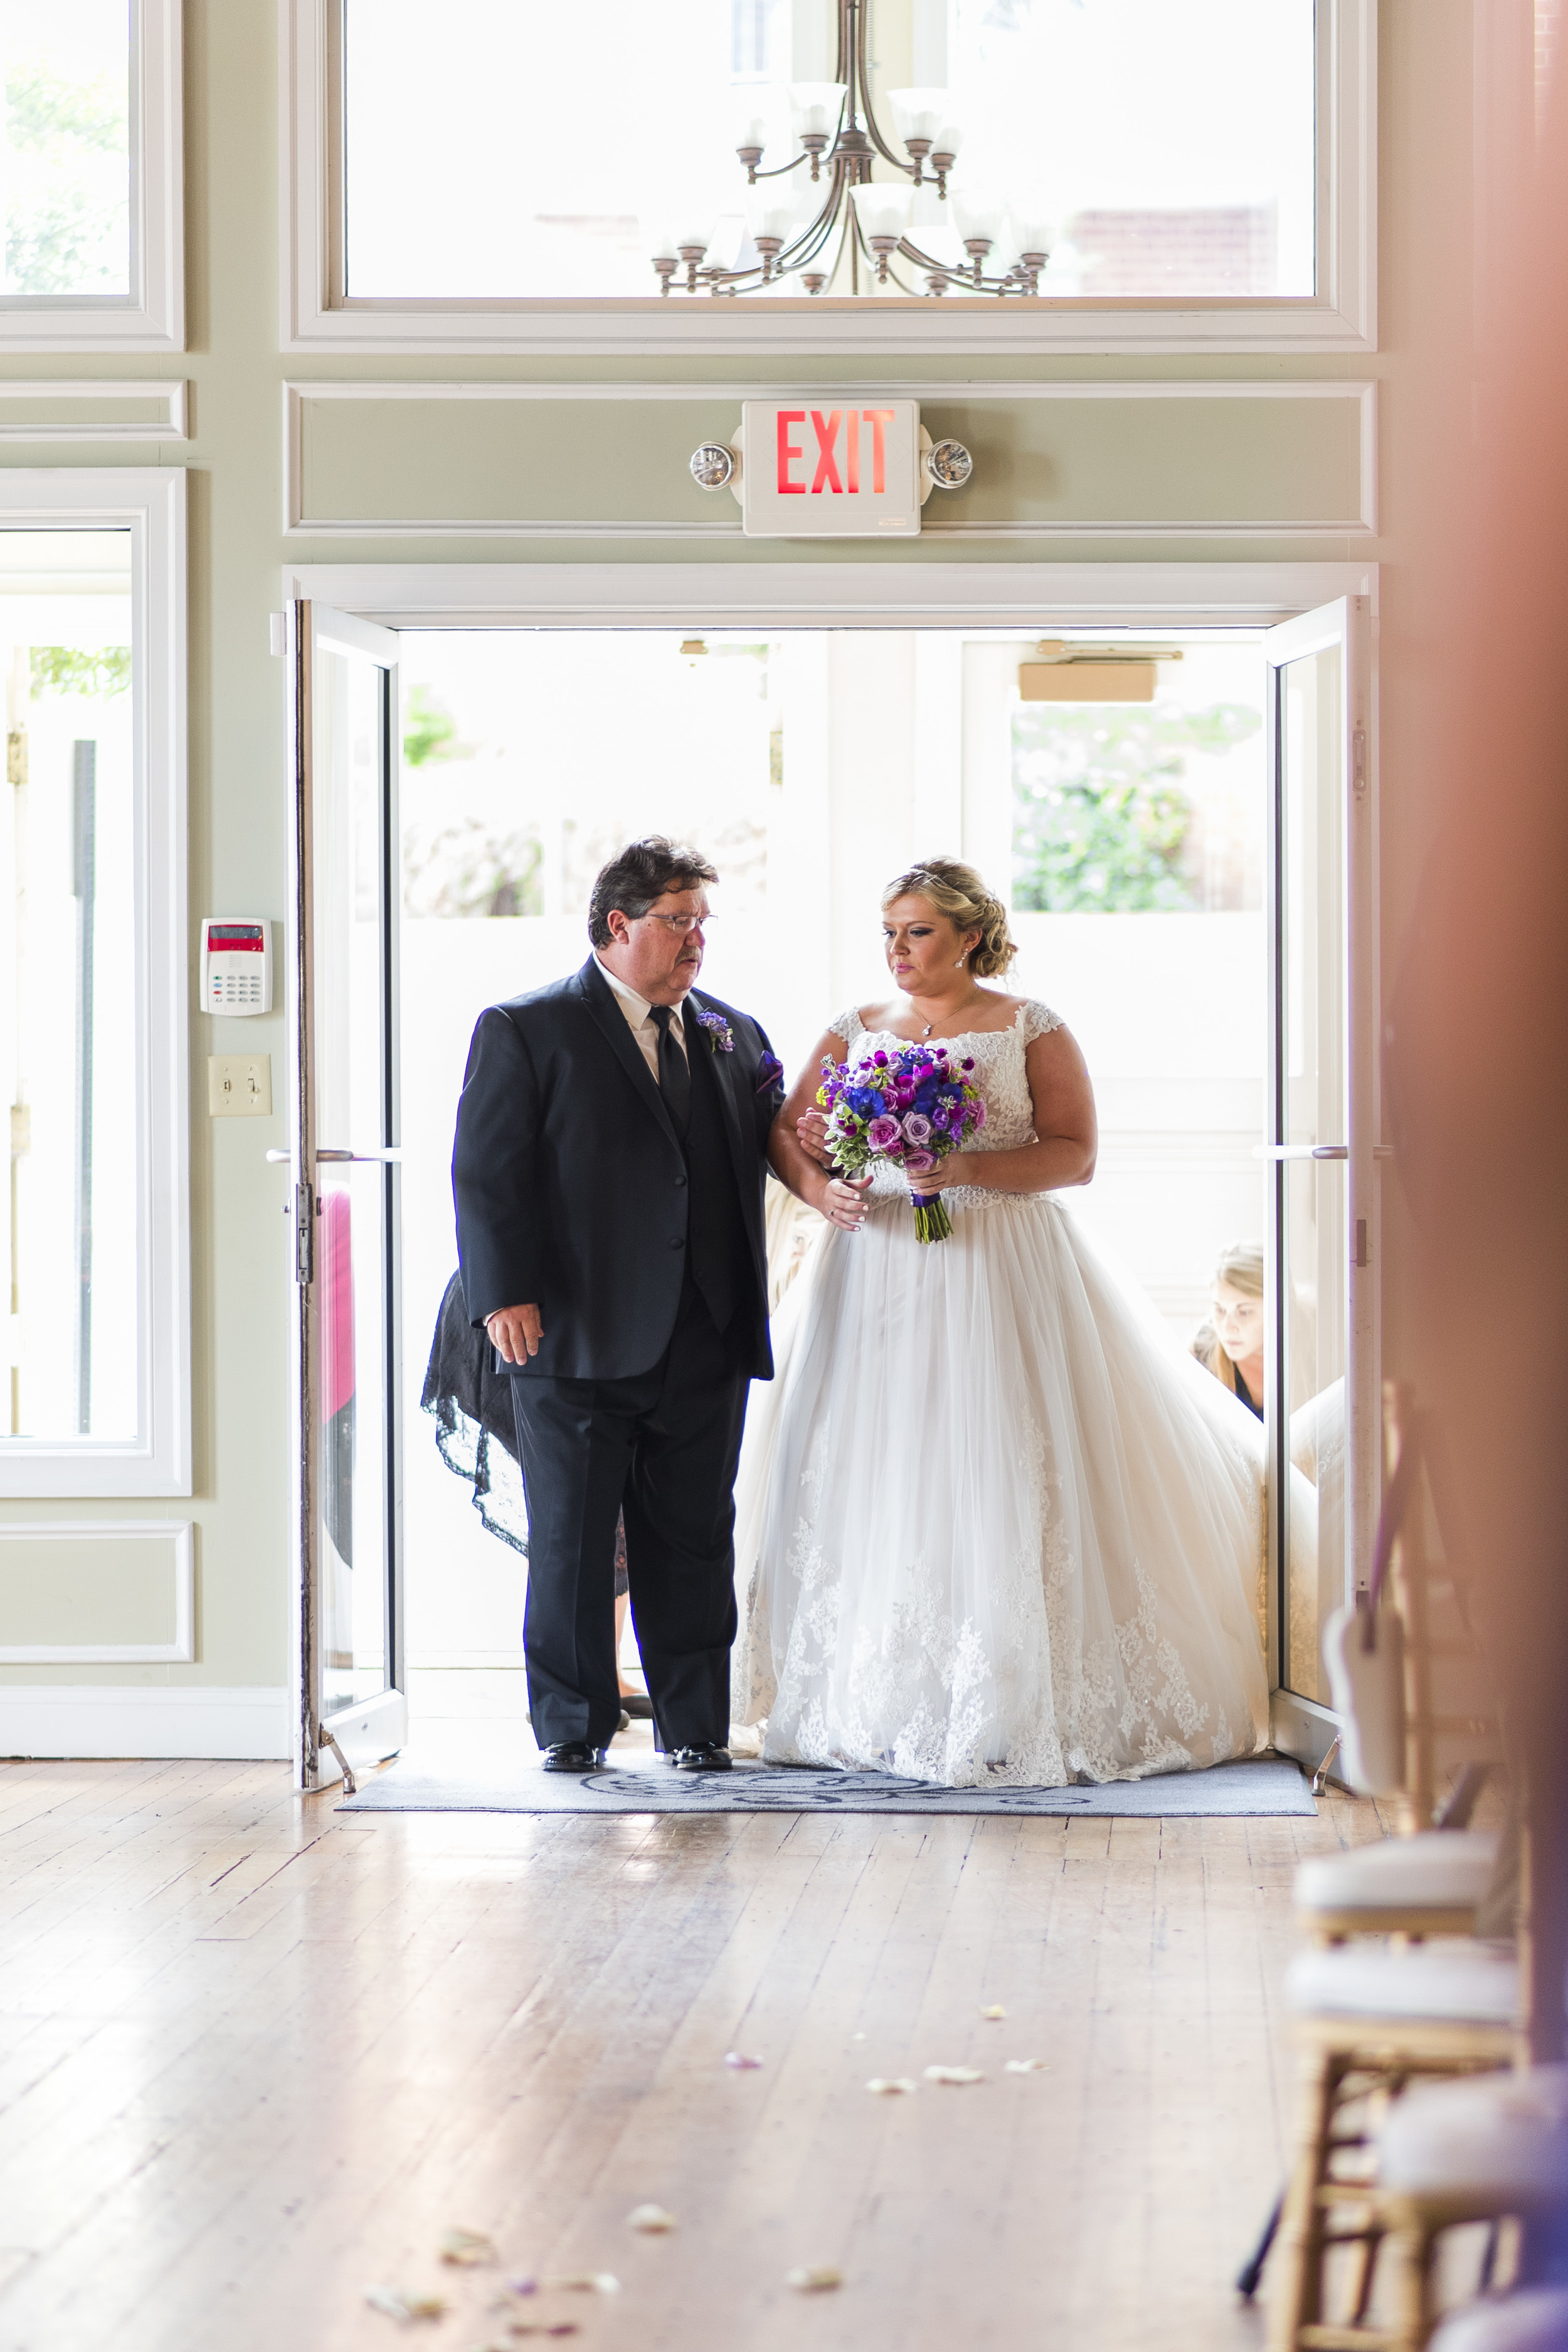 Lynchburg_VA_Wedding_Tresca on 8th_Downtown_Purple_elegant_Photos885.jpg